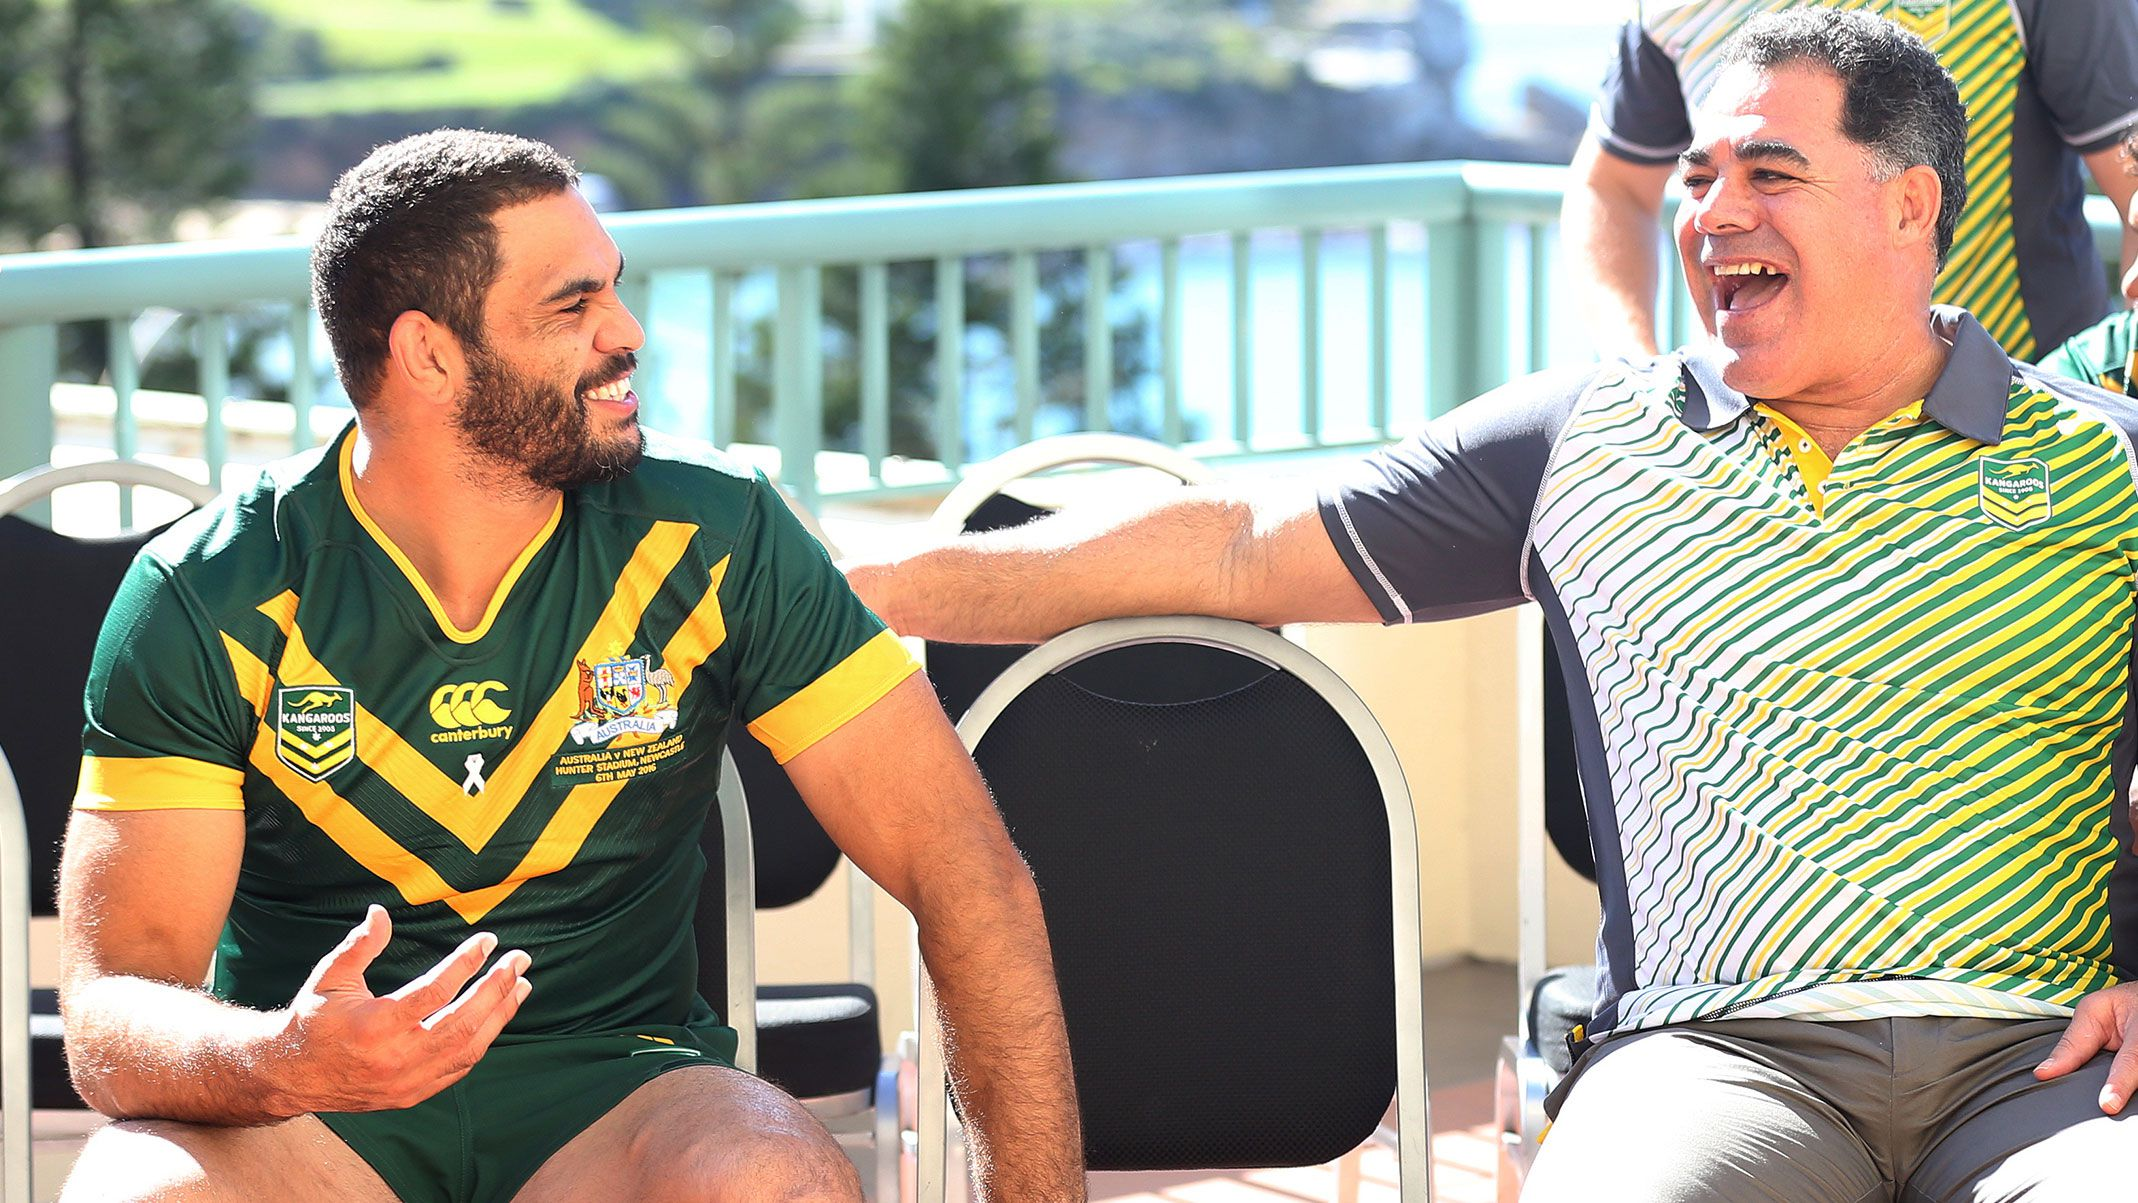 Greg Inglis will lead the Kangaroos into the new era.